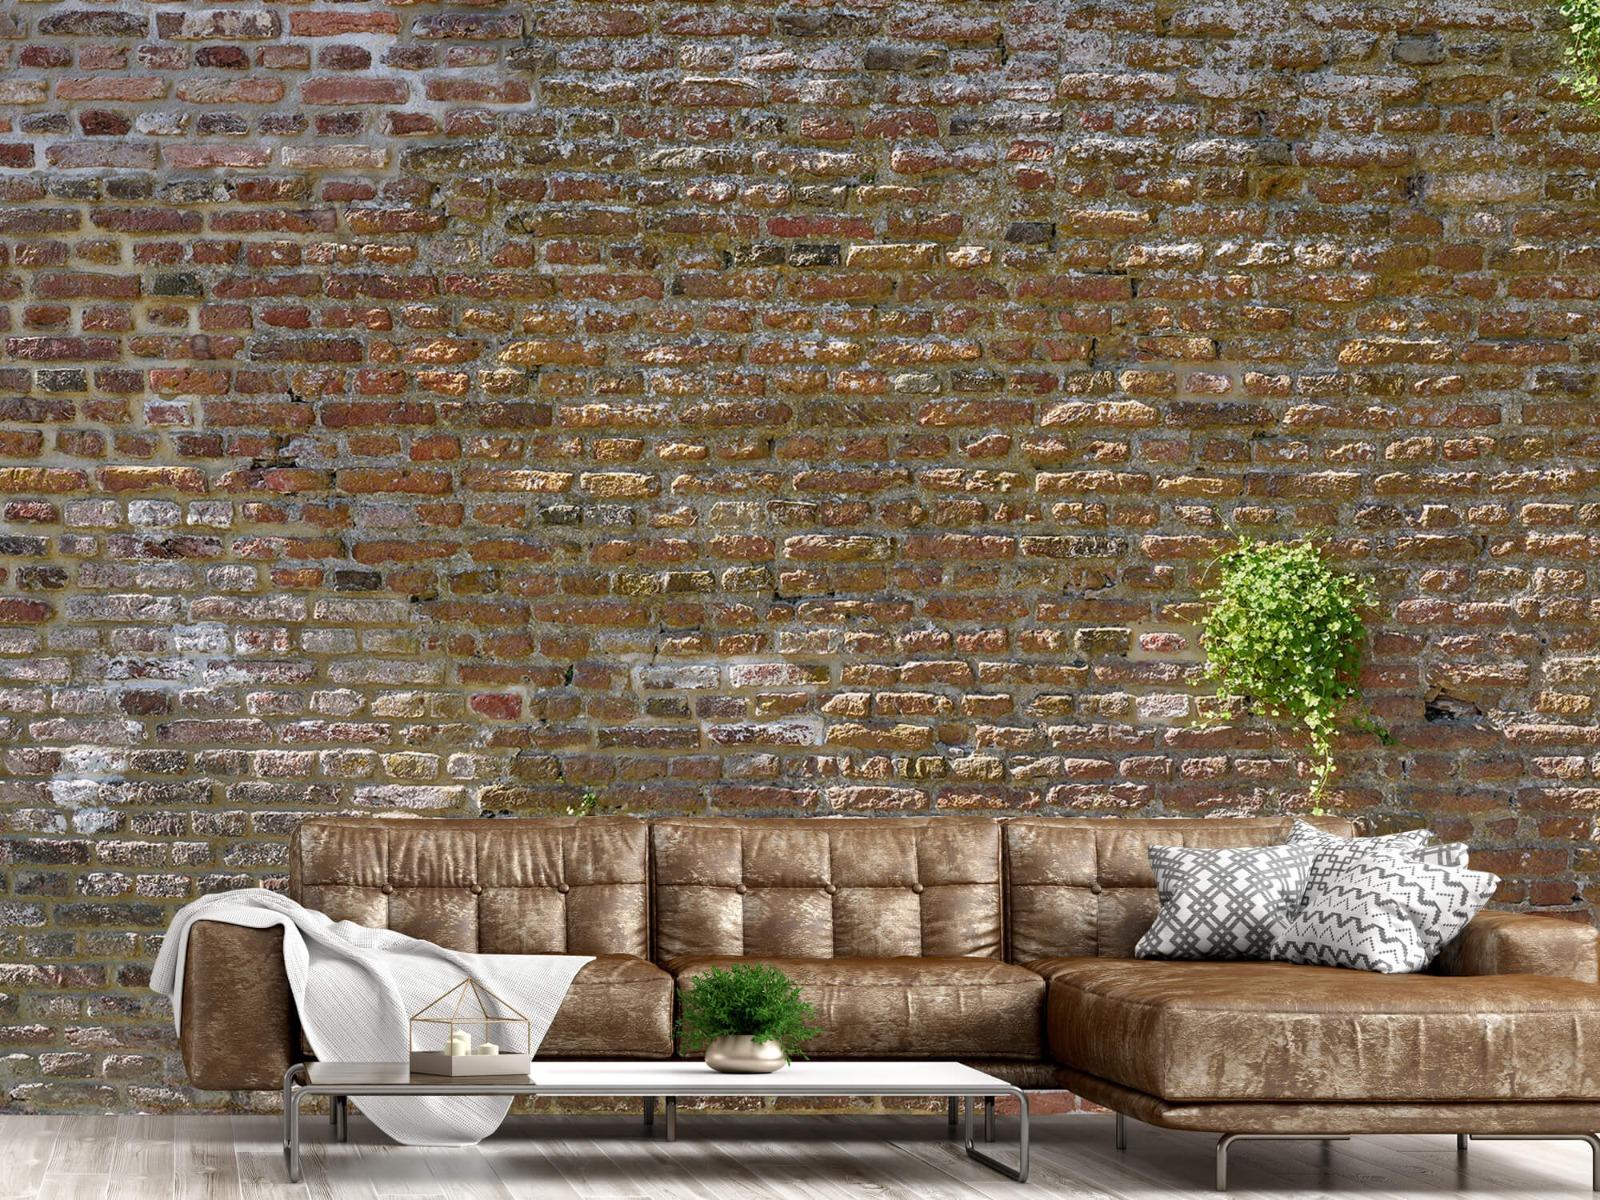 Stenen - Oude stenen stadsmuur met plantjes 14